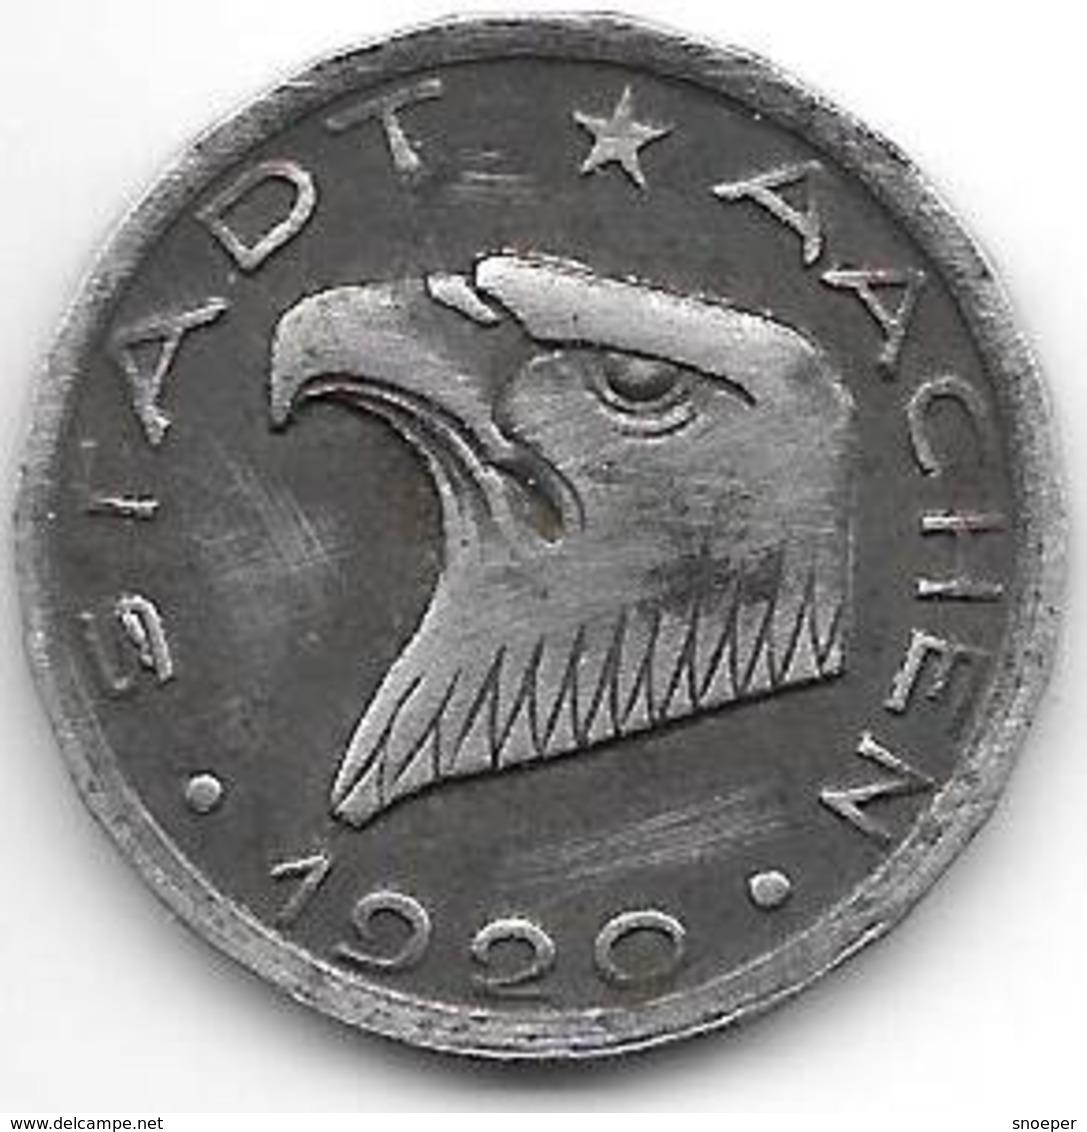 Notgeld  Aachen  50 Pfennig 1920   Fe  54.35/ F1.11A/d  K Gleich Lang 1(920)  Anstrich 1,5 Mm - [ 2] 1871-1918 : Empire Allemand